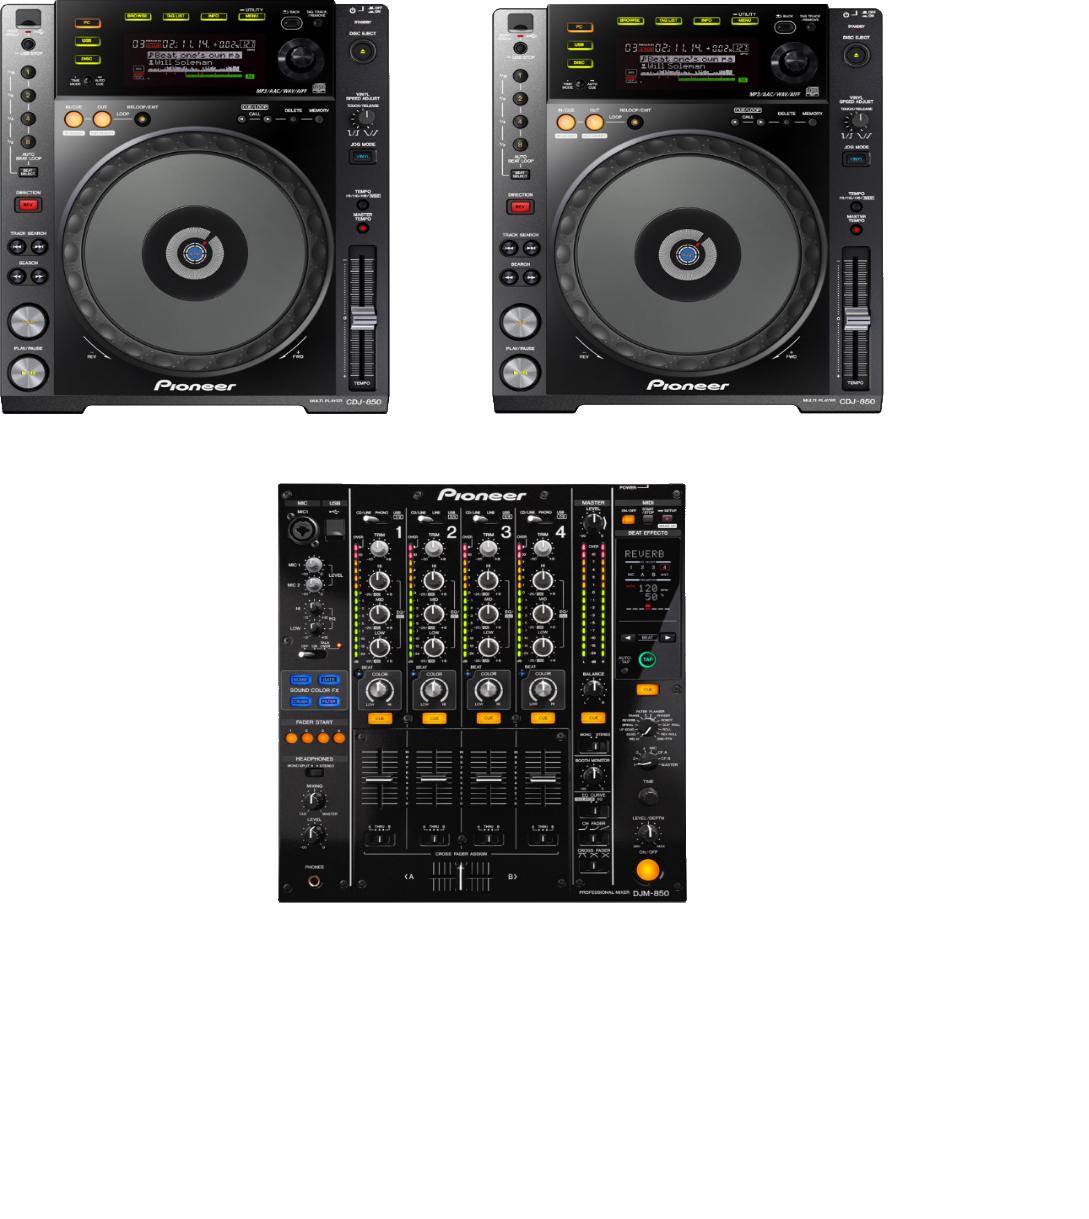 DJ set Pioneer DJM 850 + 2 x CDJ 850